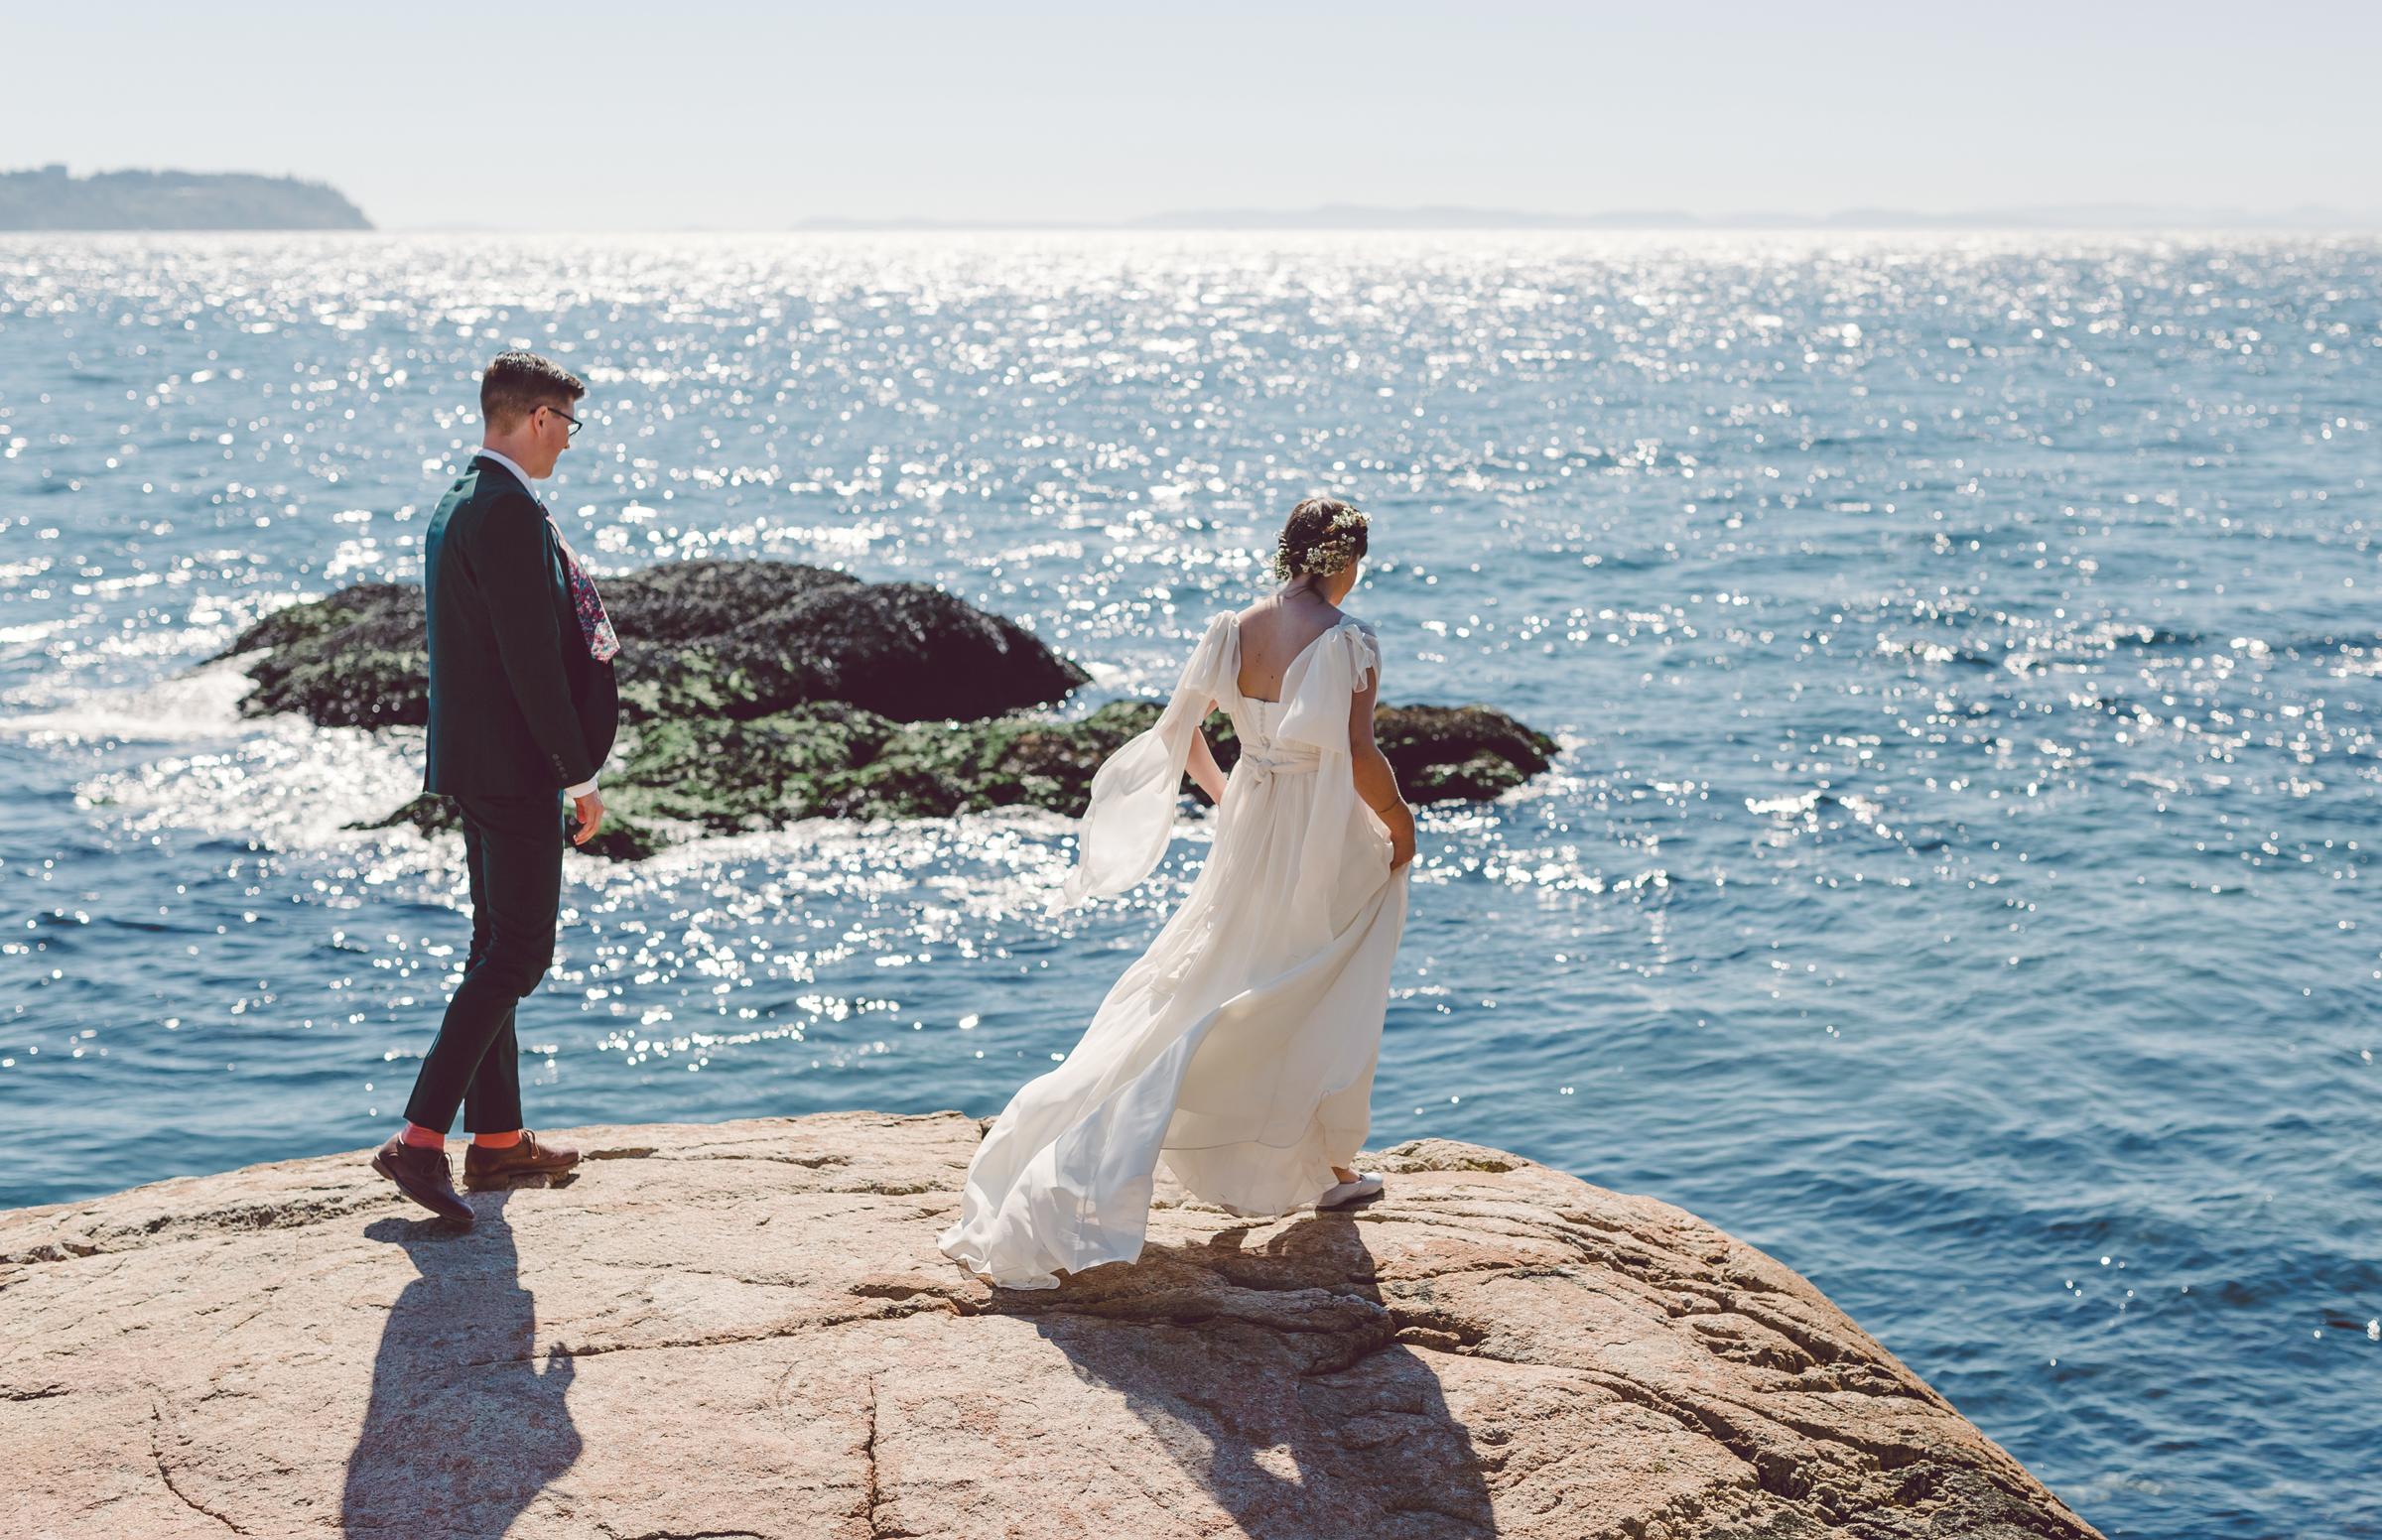 IMG_1939-VANCOUVER-WEDDING-PHOTOGRAPHER-JENNIFER-PICARD-PHOTOGRAPHY-WEB.jpg